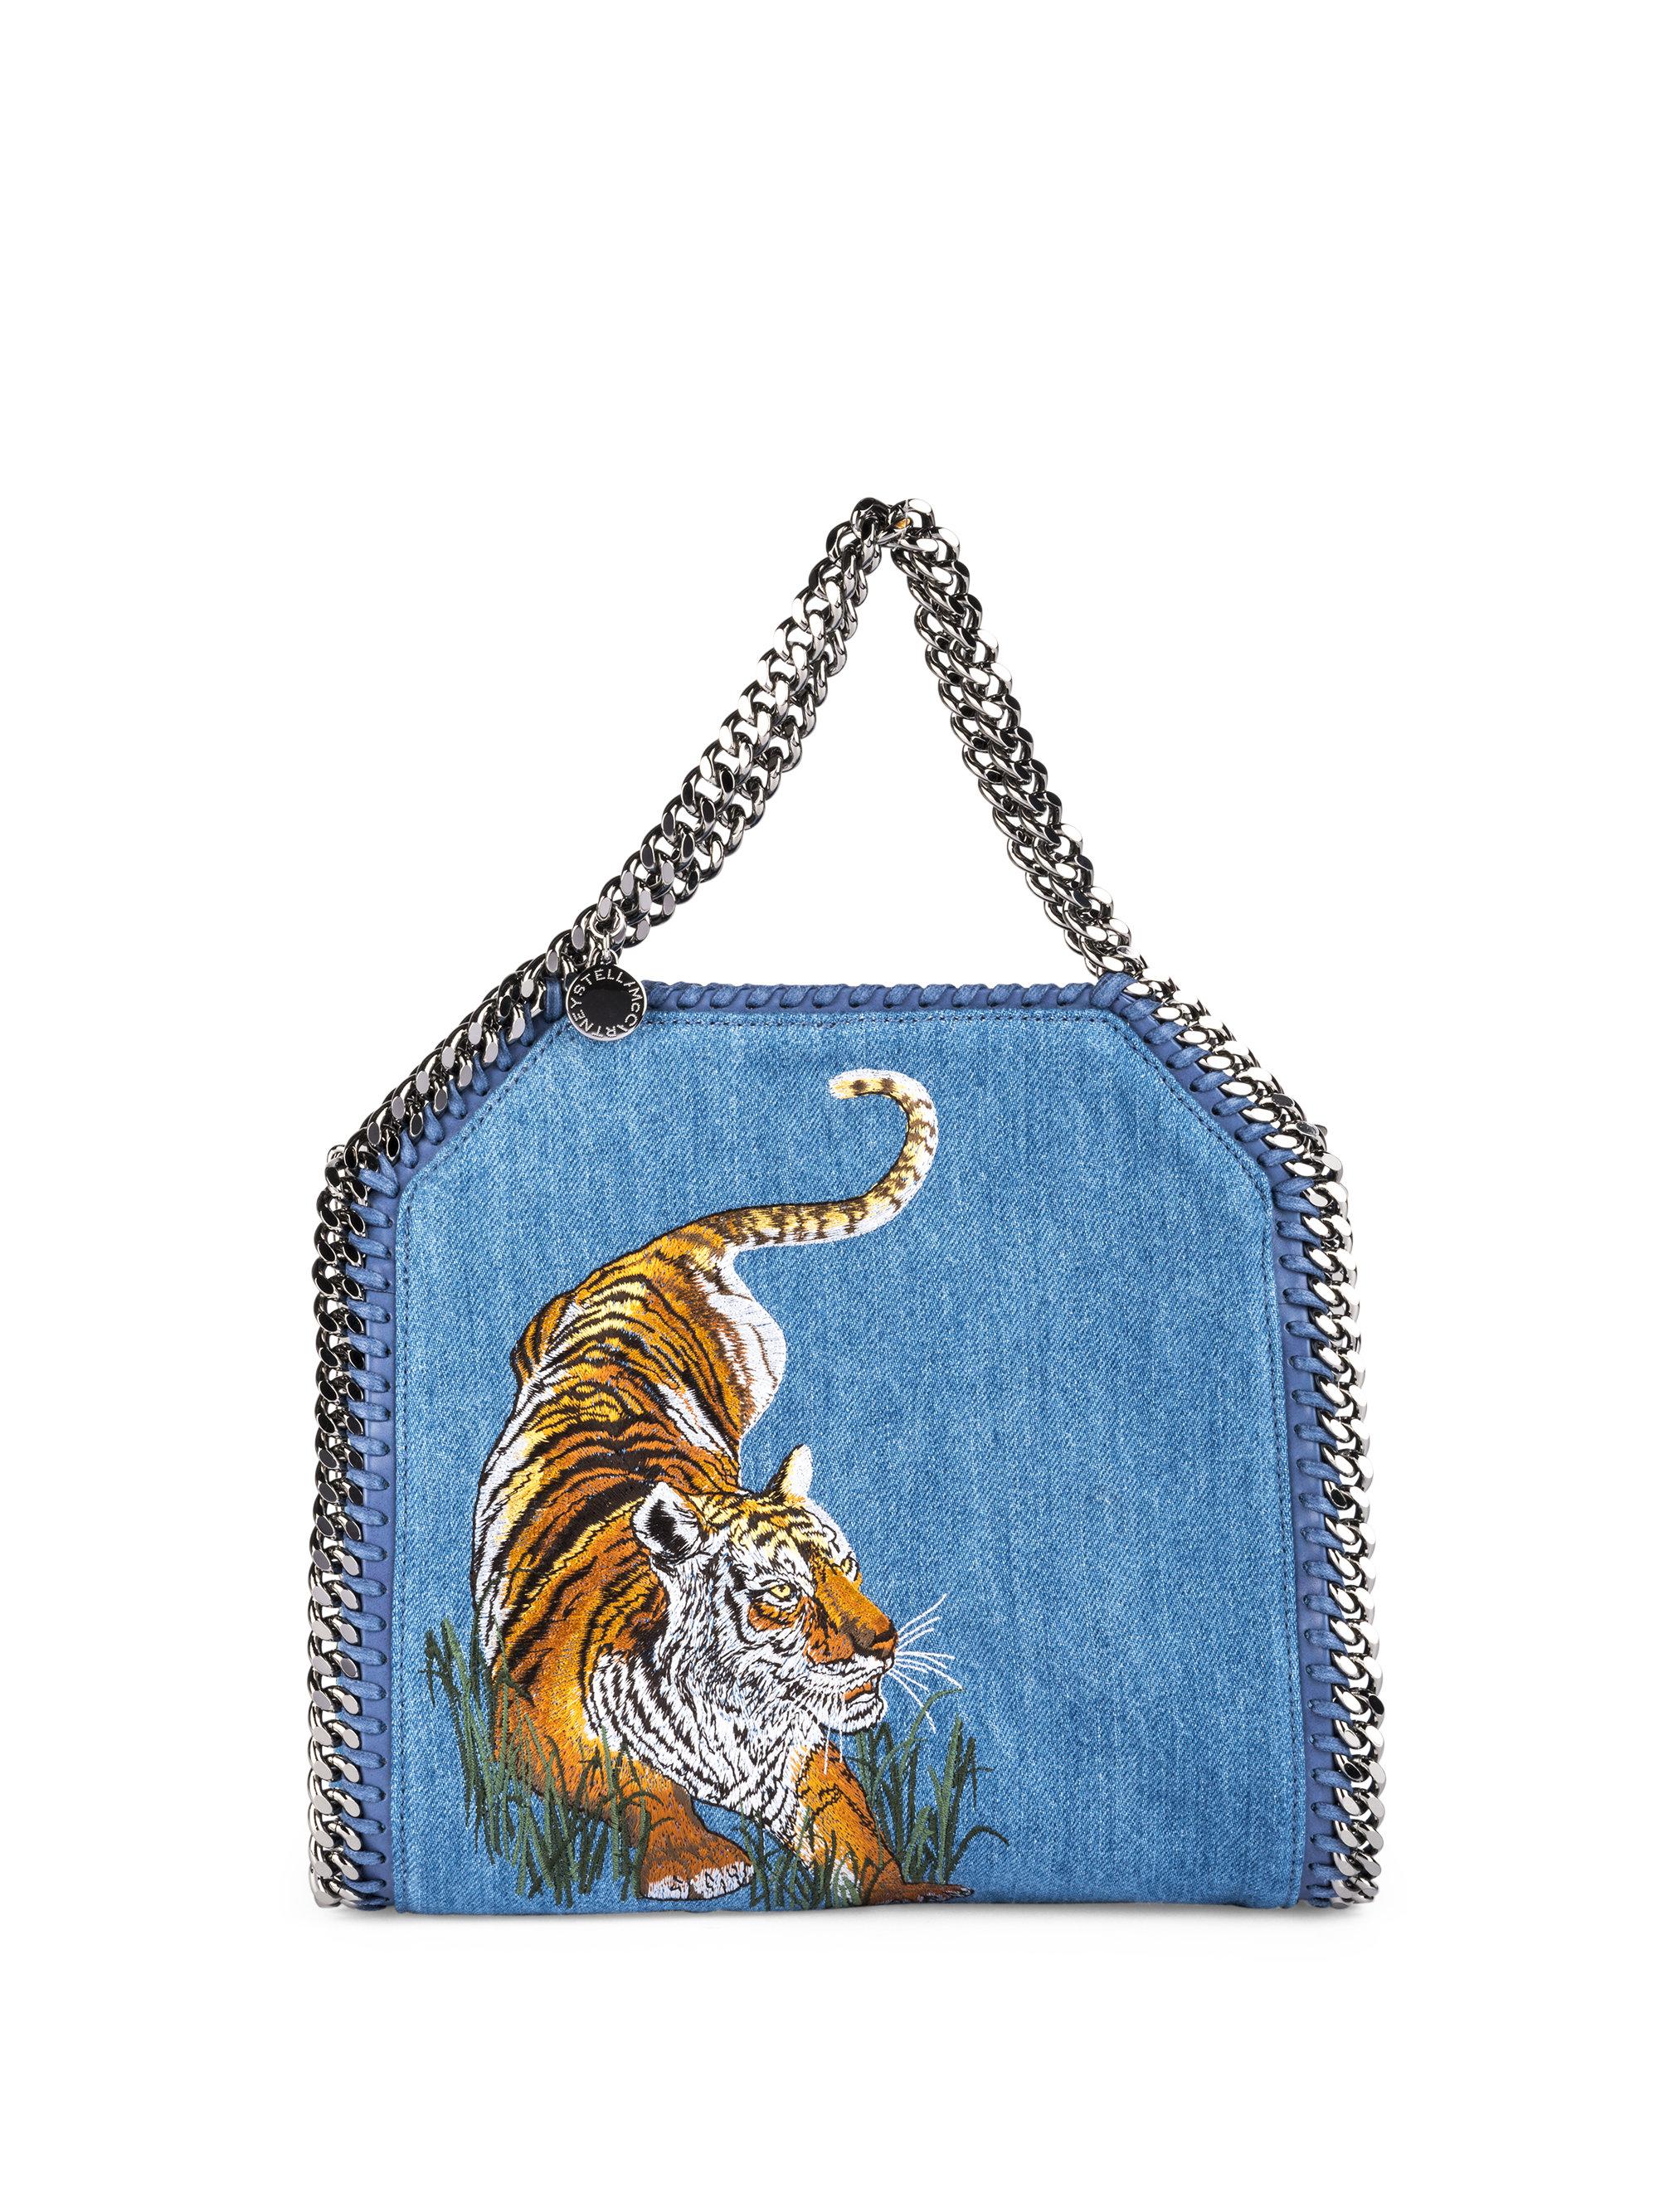 aeb1991c19c25 Lyst - Stella McCartney Mini Baby Bella Embroidered Tiger Denim Tote ...